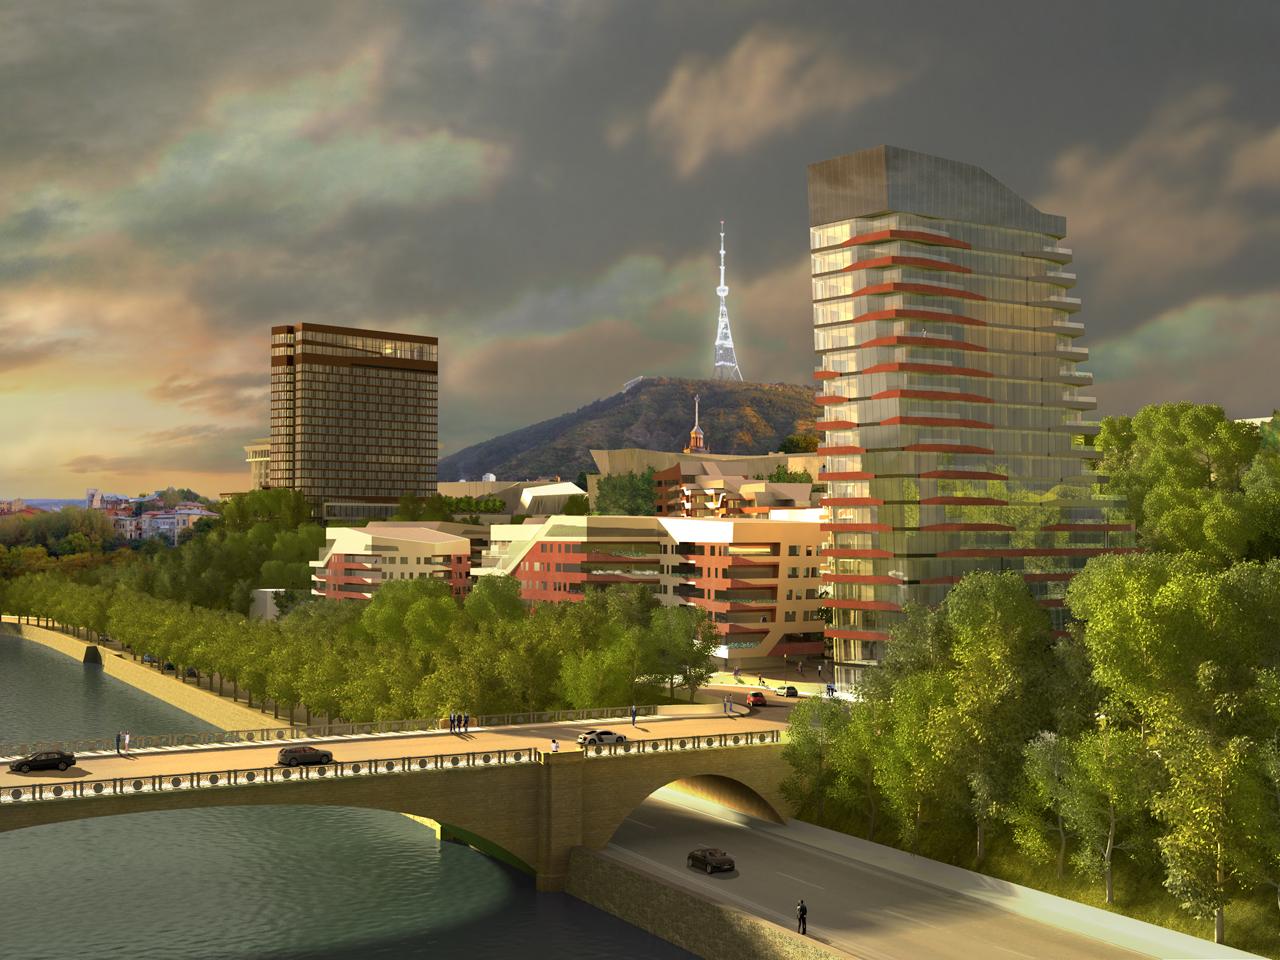 sakanela urban landscape |